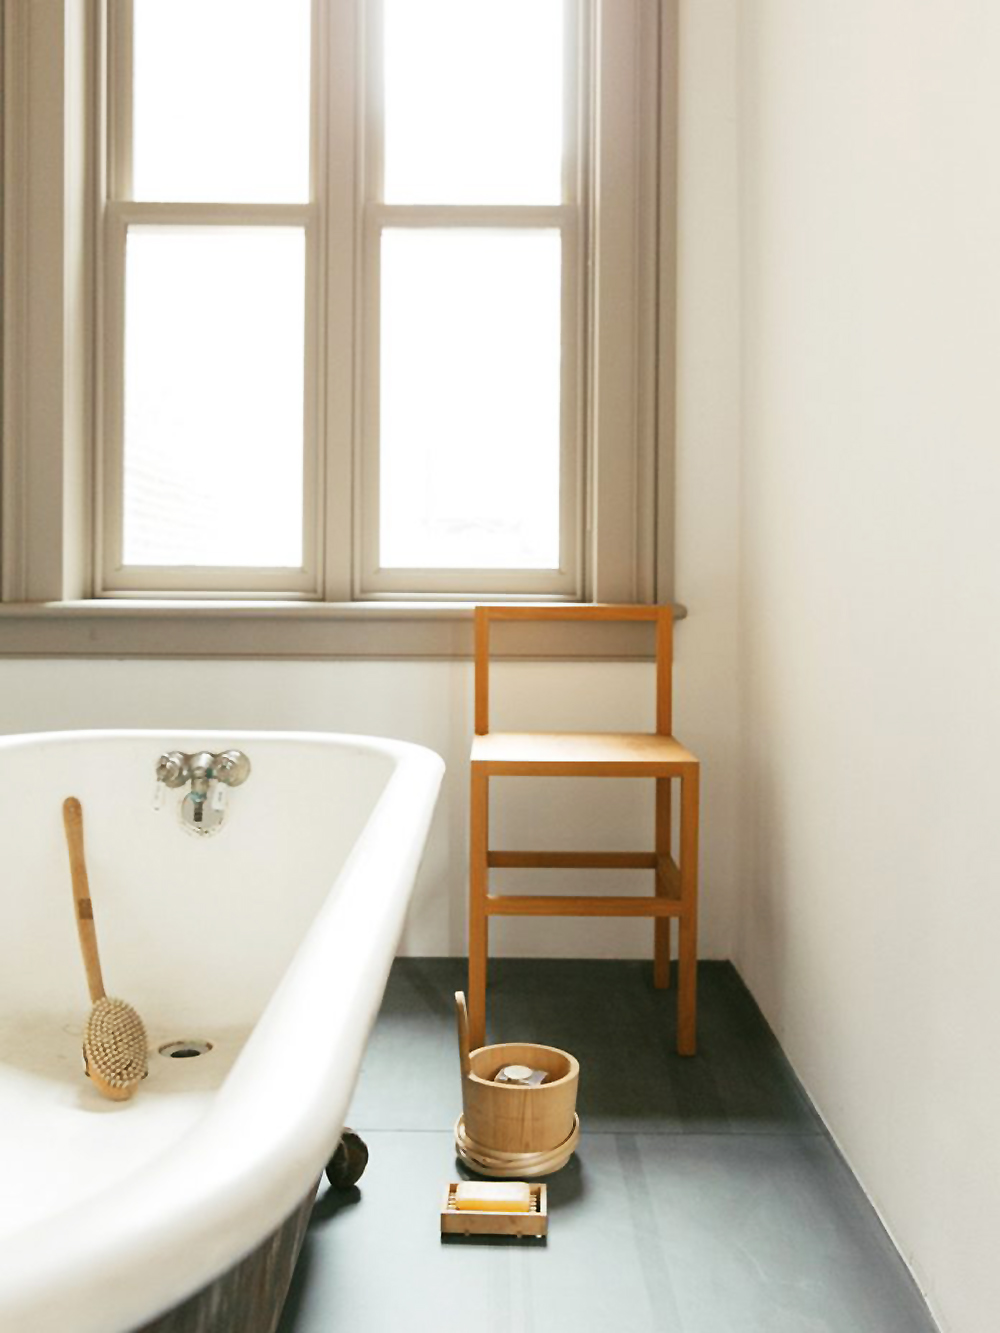 Donald Judd, Judd Foundation, interiors, sunday sanctuary, oracle fox, bath, bathroom